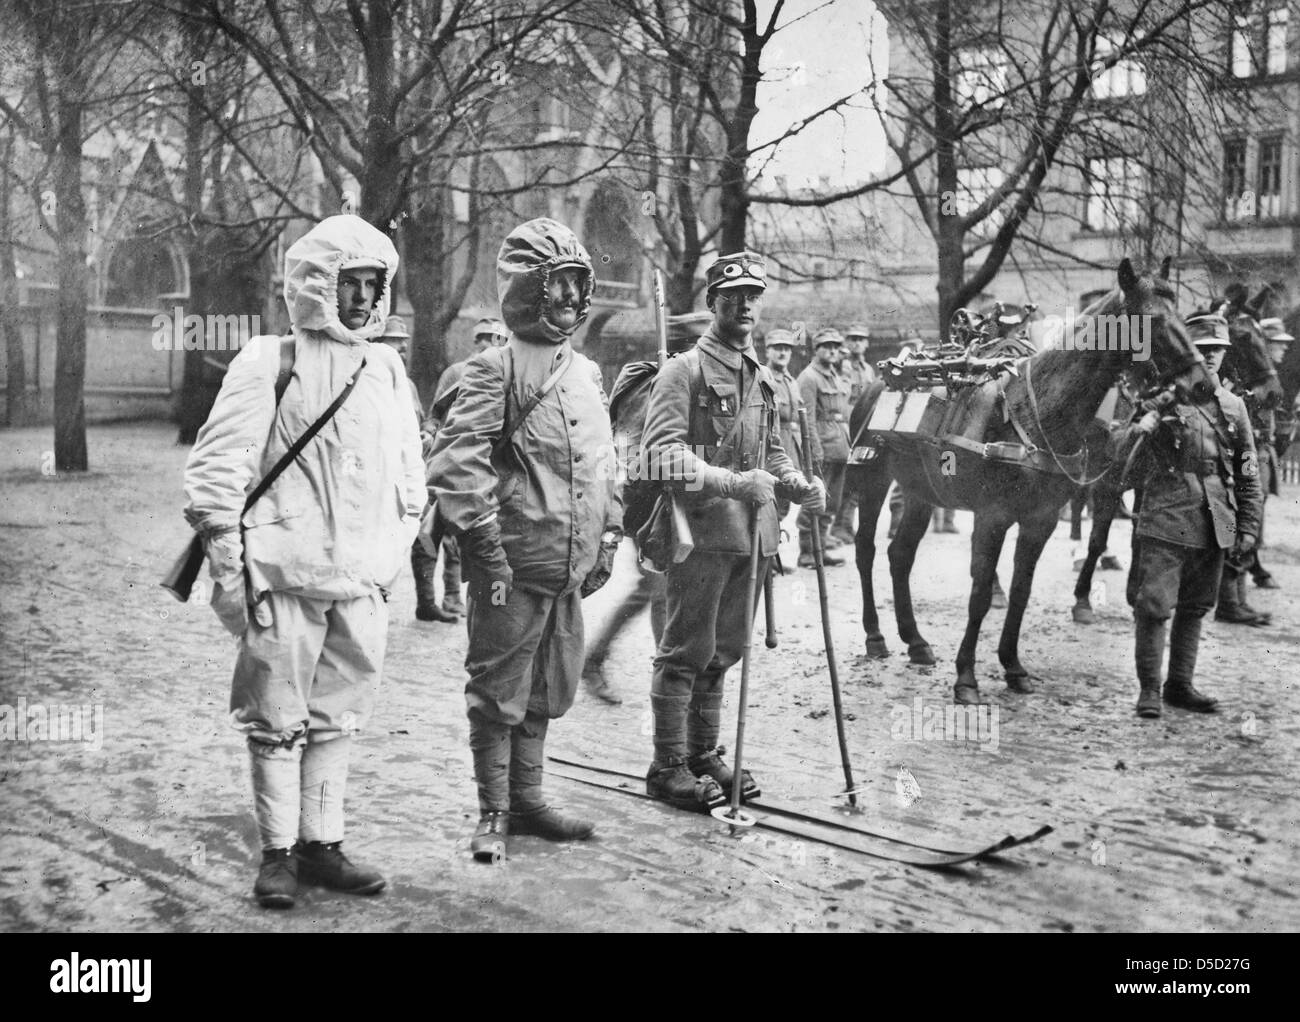 Uniform of German Snowshoe Battalion, circa 1910 - Stock Image